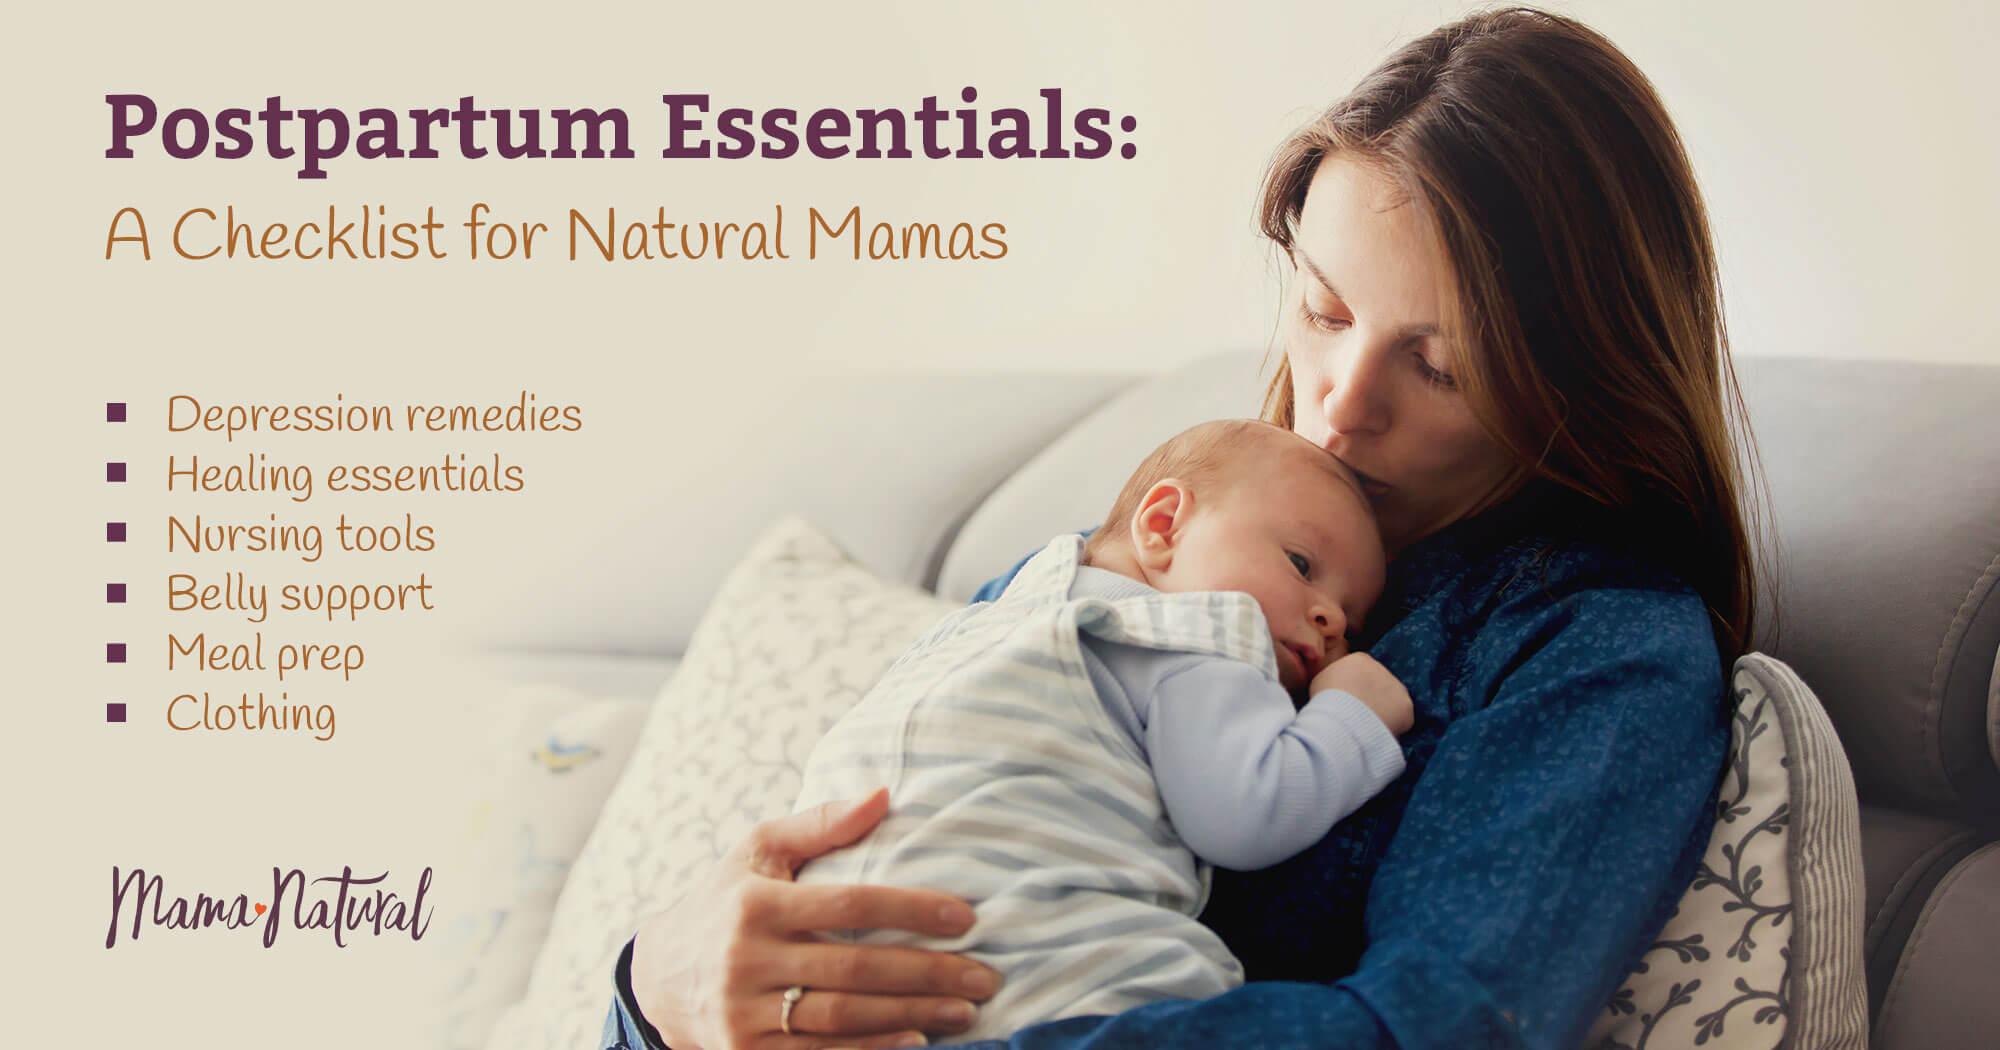 Postpartum Recovery Essentials: A Checklist for Natural Mamas